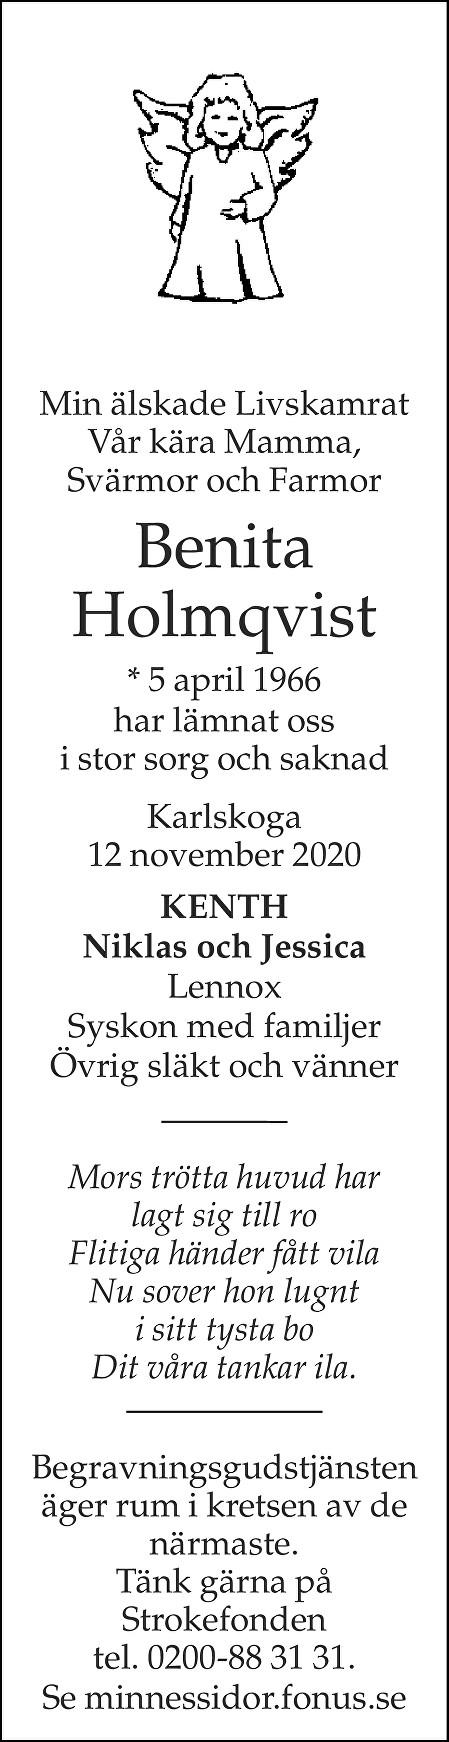 Benita Holmqvist Death notice